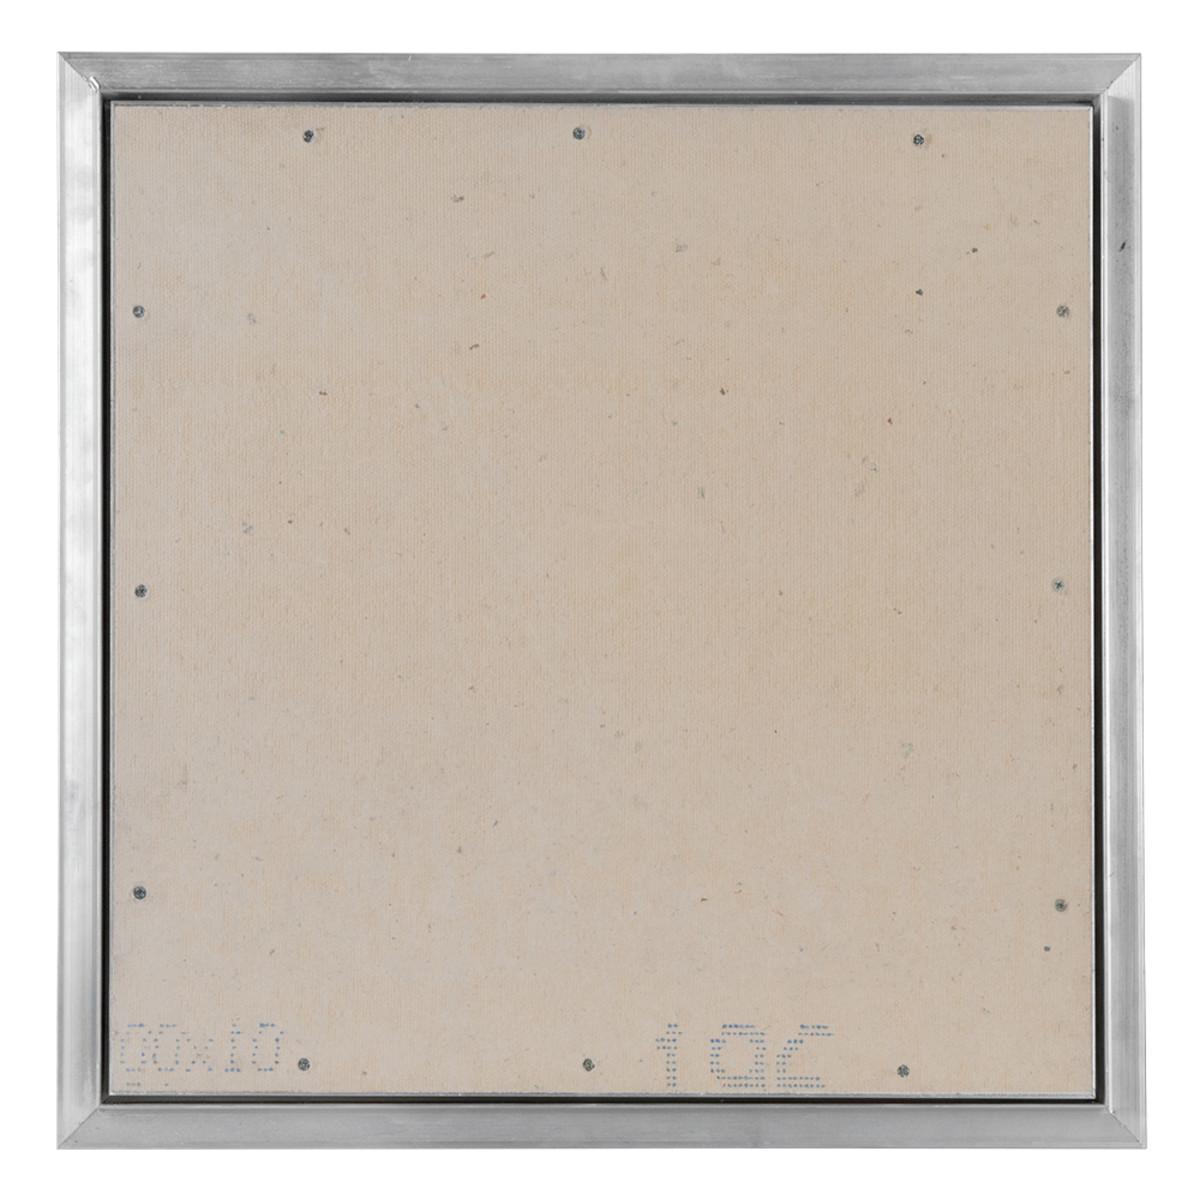 Люк ревизионный АРРЗ-Премиум 500x400 см металл